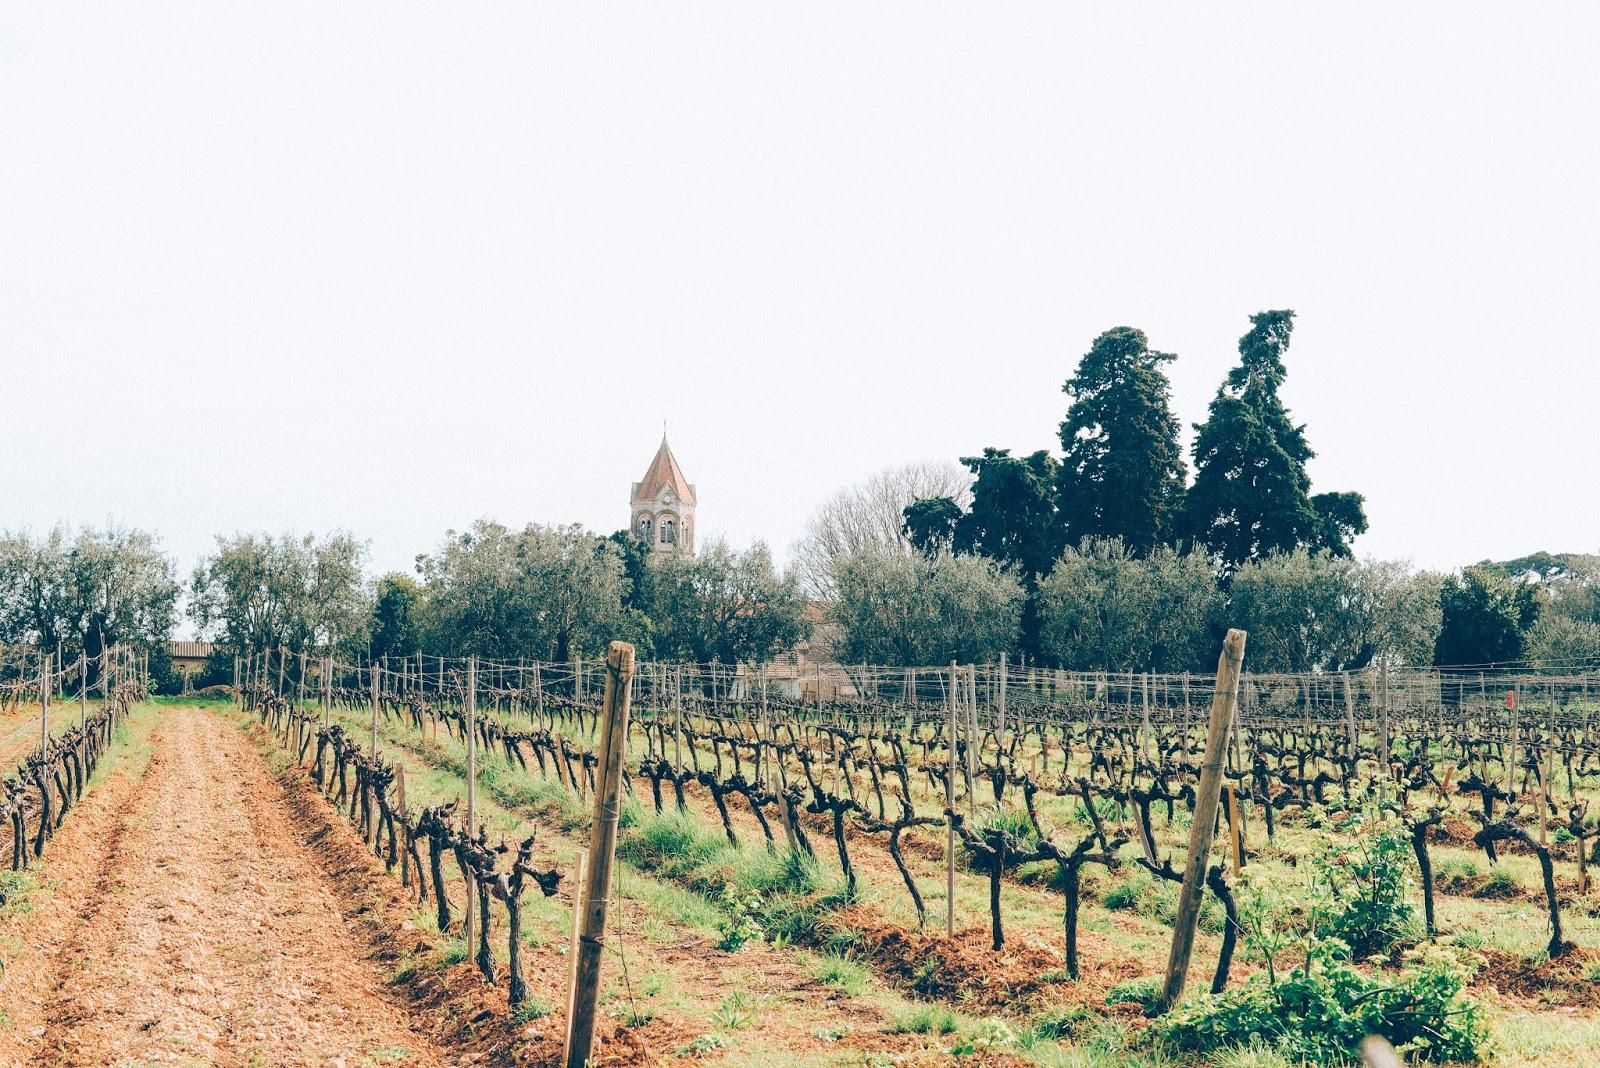 Vignoble abbaye Saint-Honorat